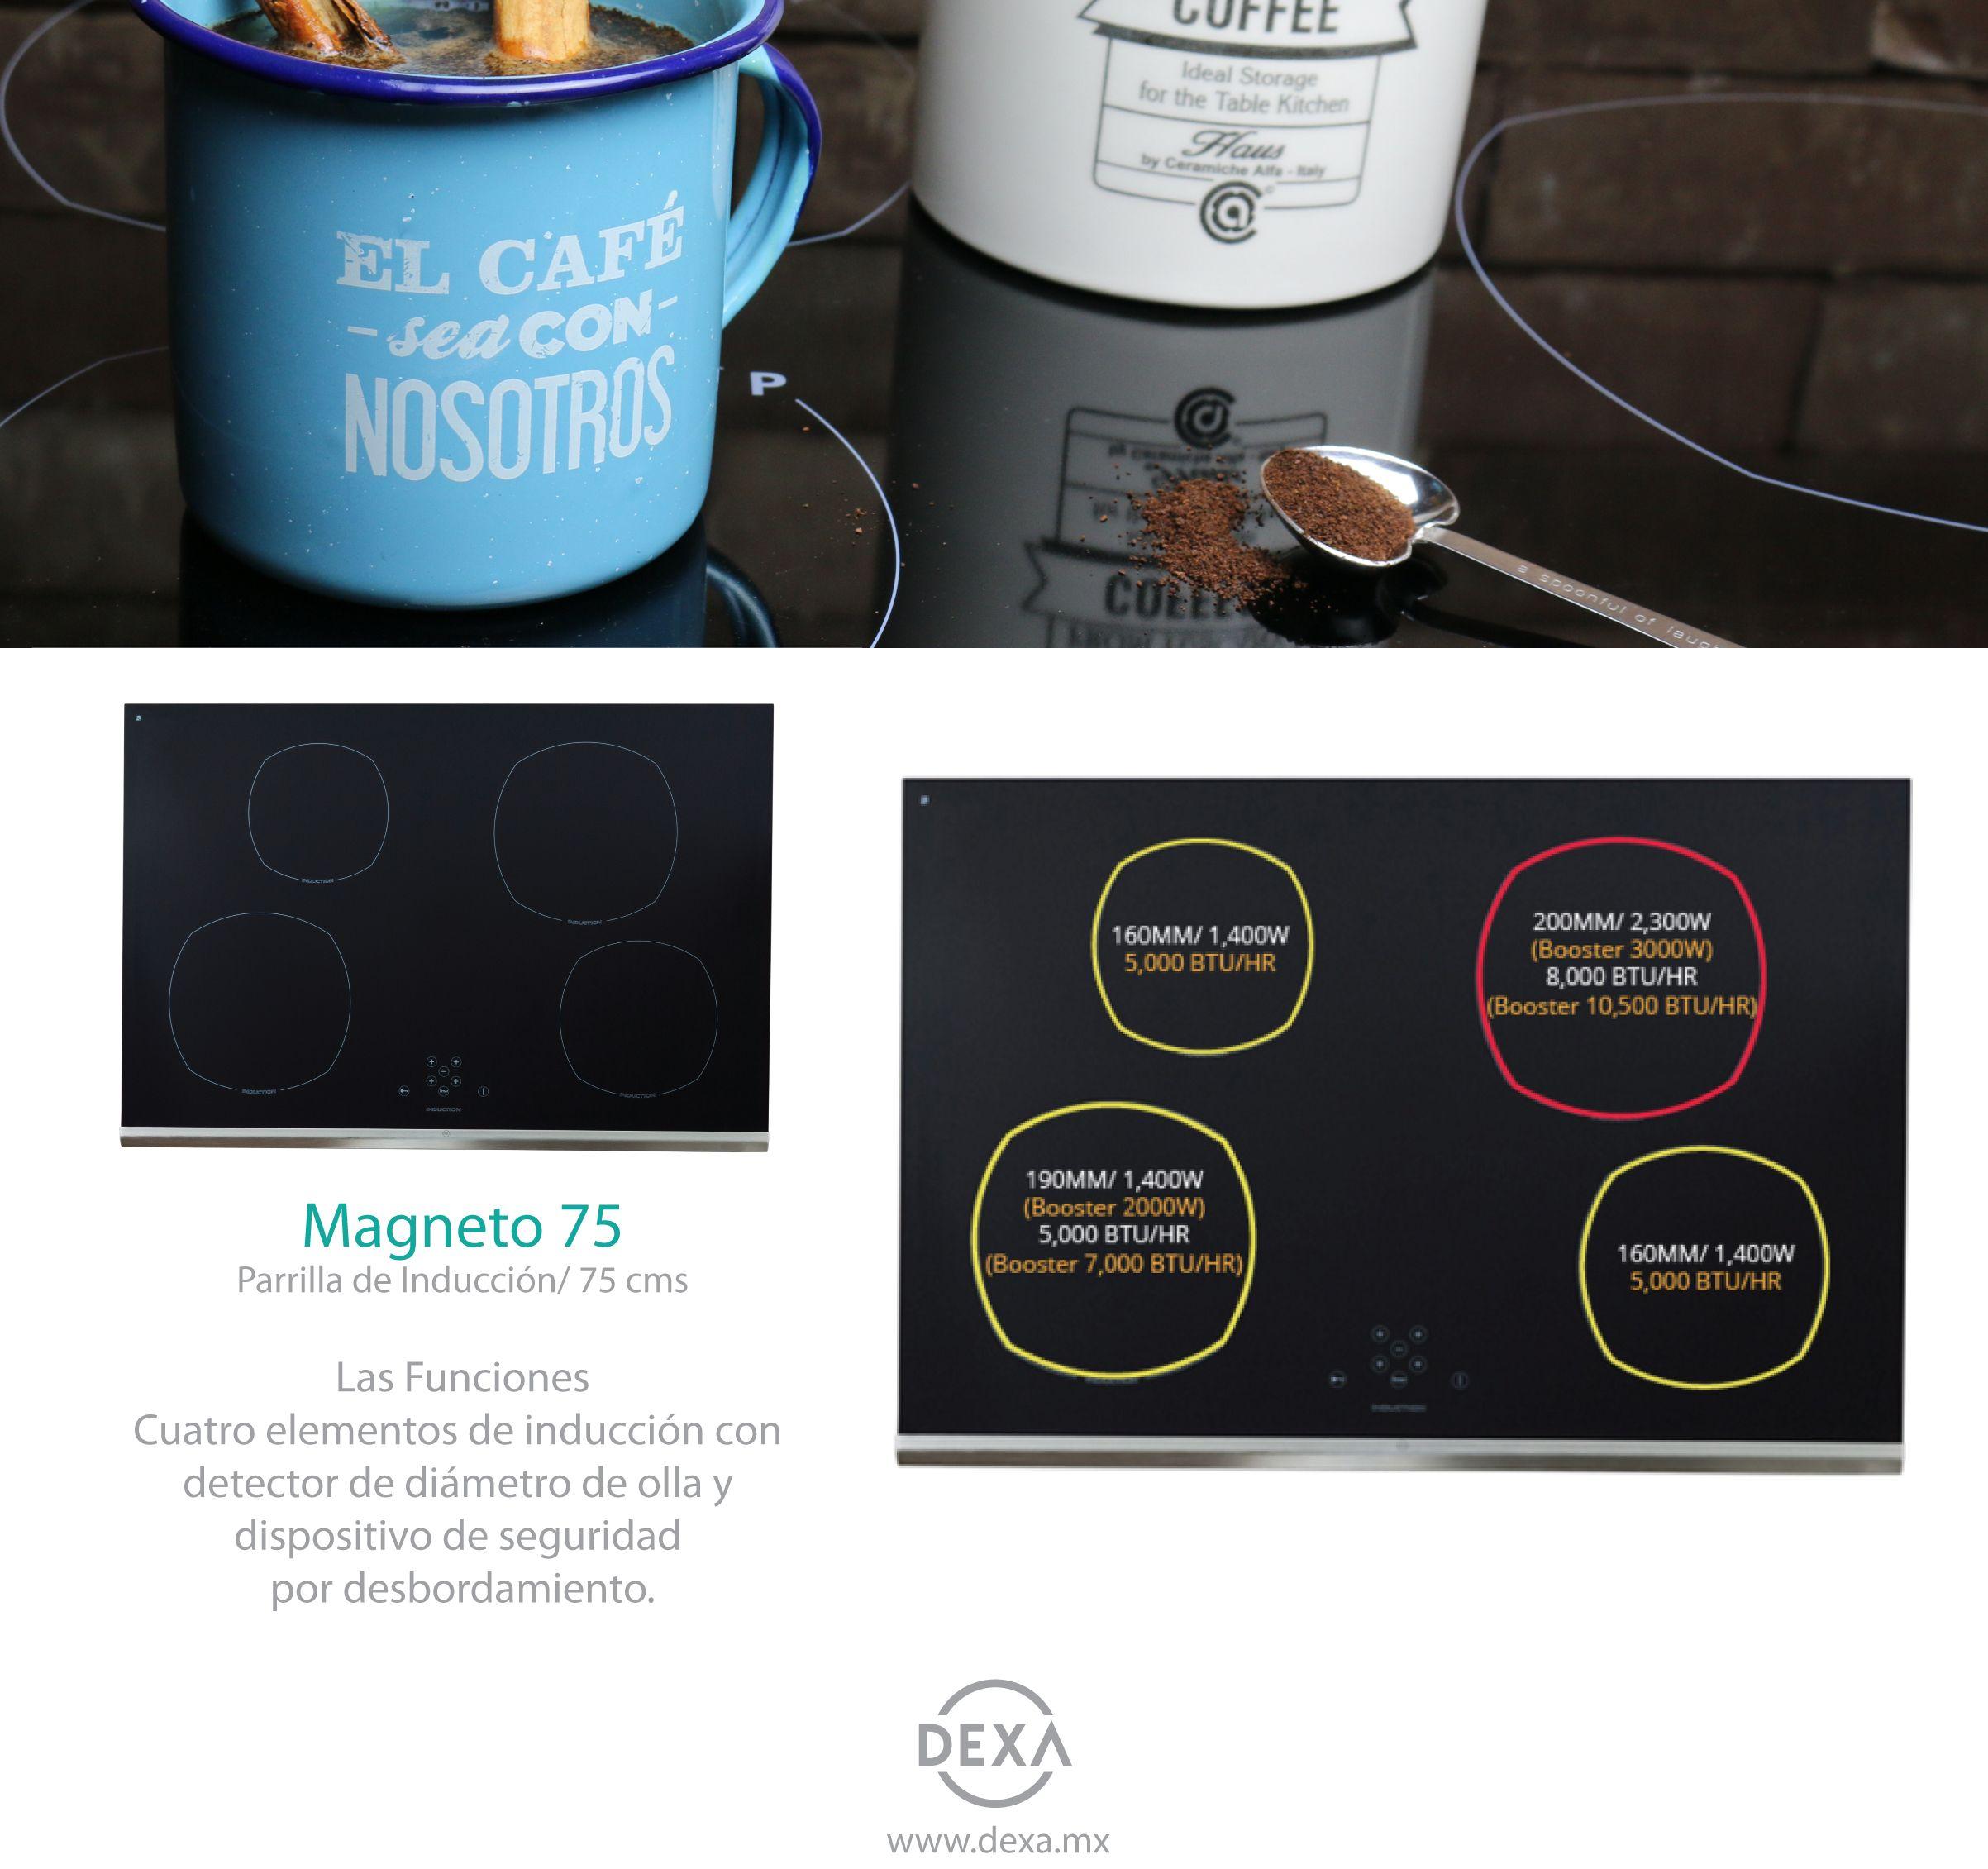 Parrilla de Inducción Magneto 75 #dexa | CONÓCENOS MEJOR | Pinterest ...